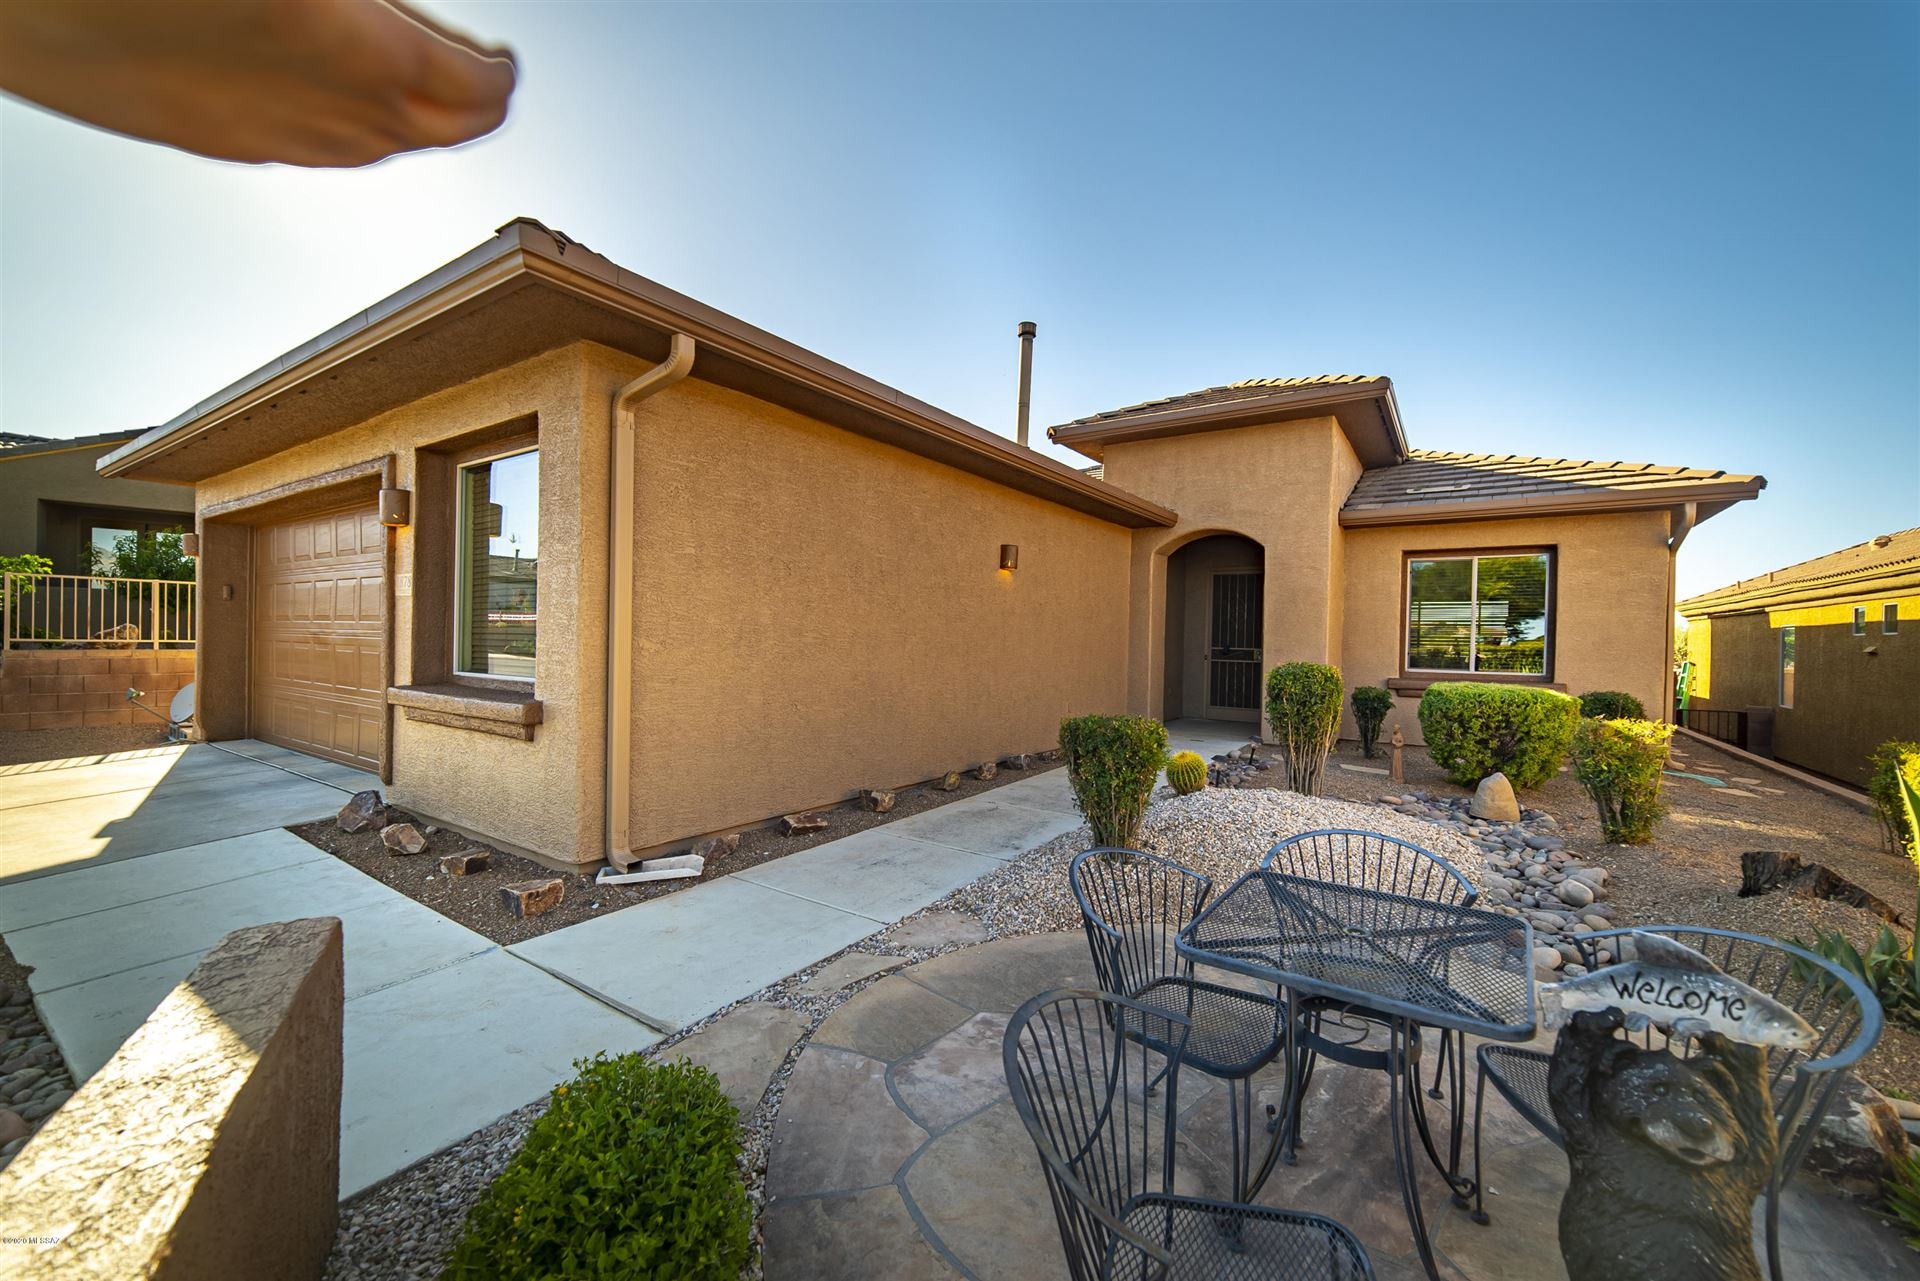 1878 W Acacia Bluffs Drive, Green Valley, AZ 85622 - MLS#: 22015545